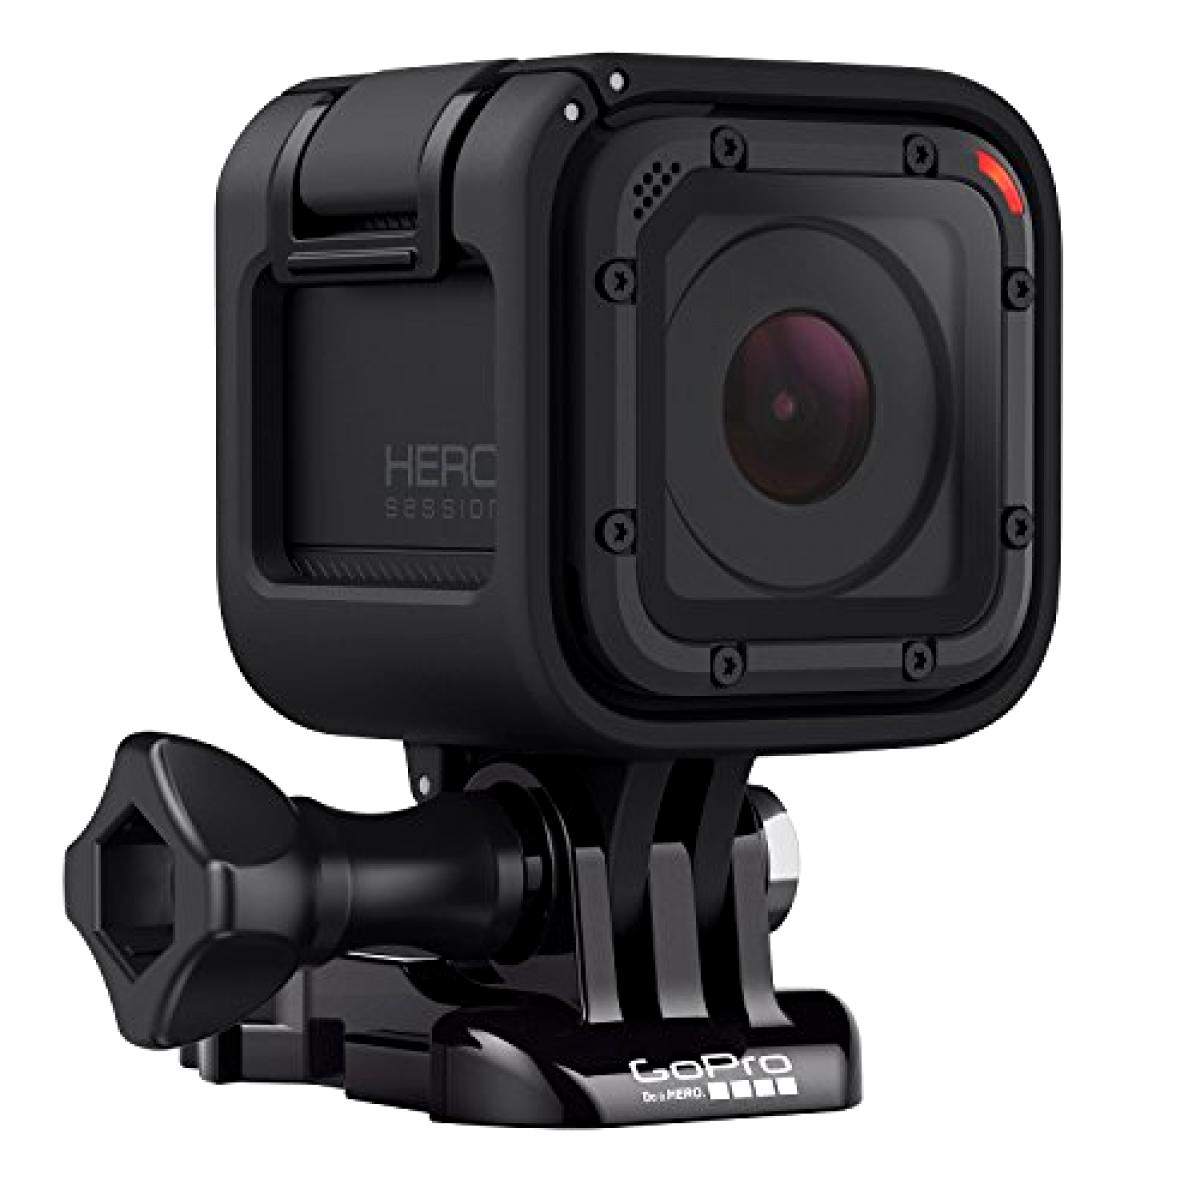 GOPRO HERO Session HD Movement Digitised digicam WiFi Video 1080p Videocamera Mint